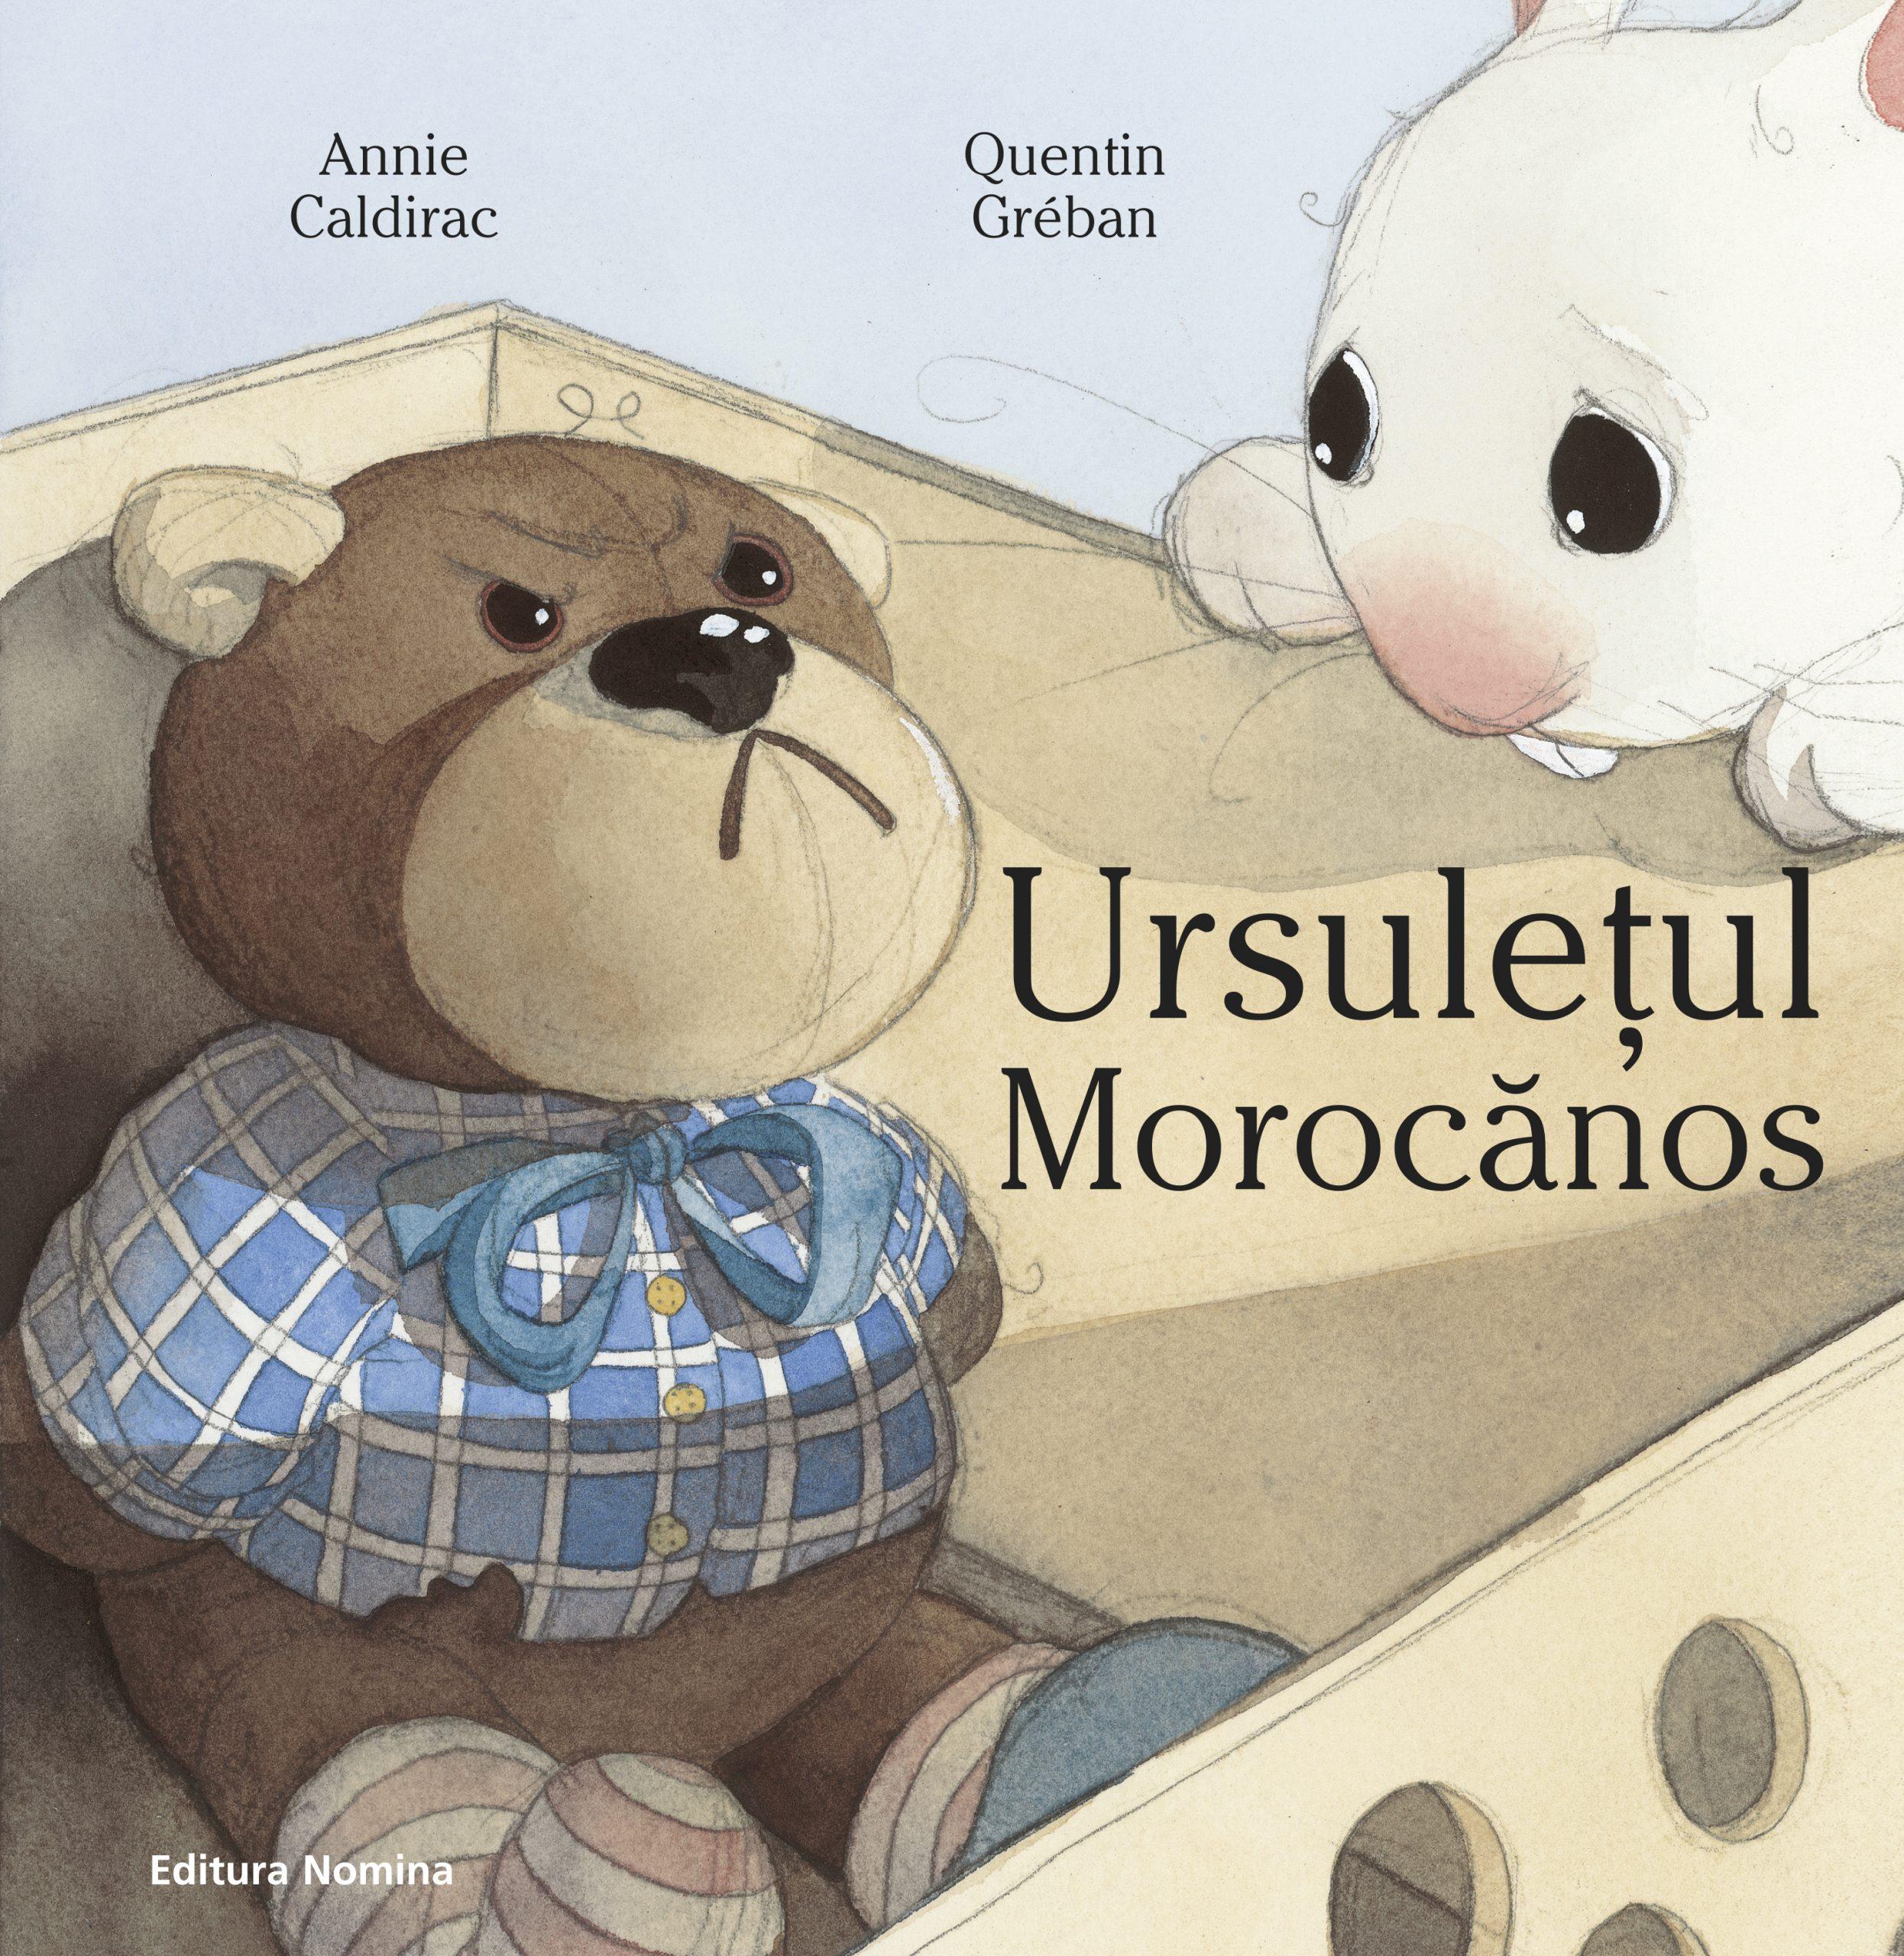 Ursuletul Morocanos